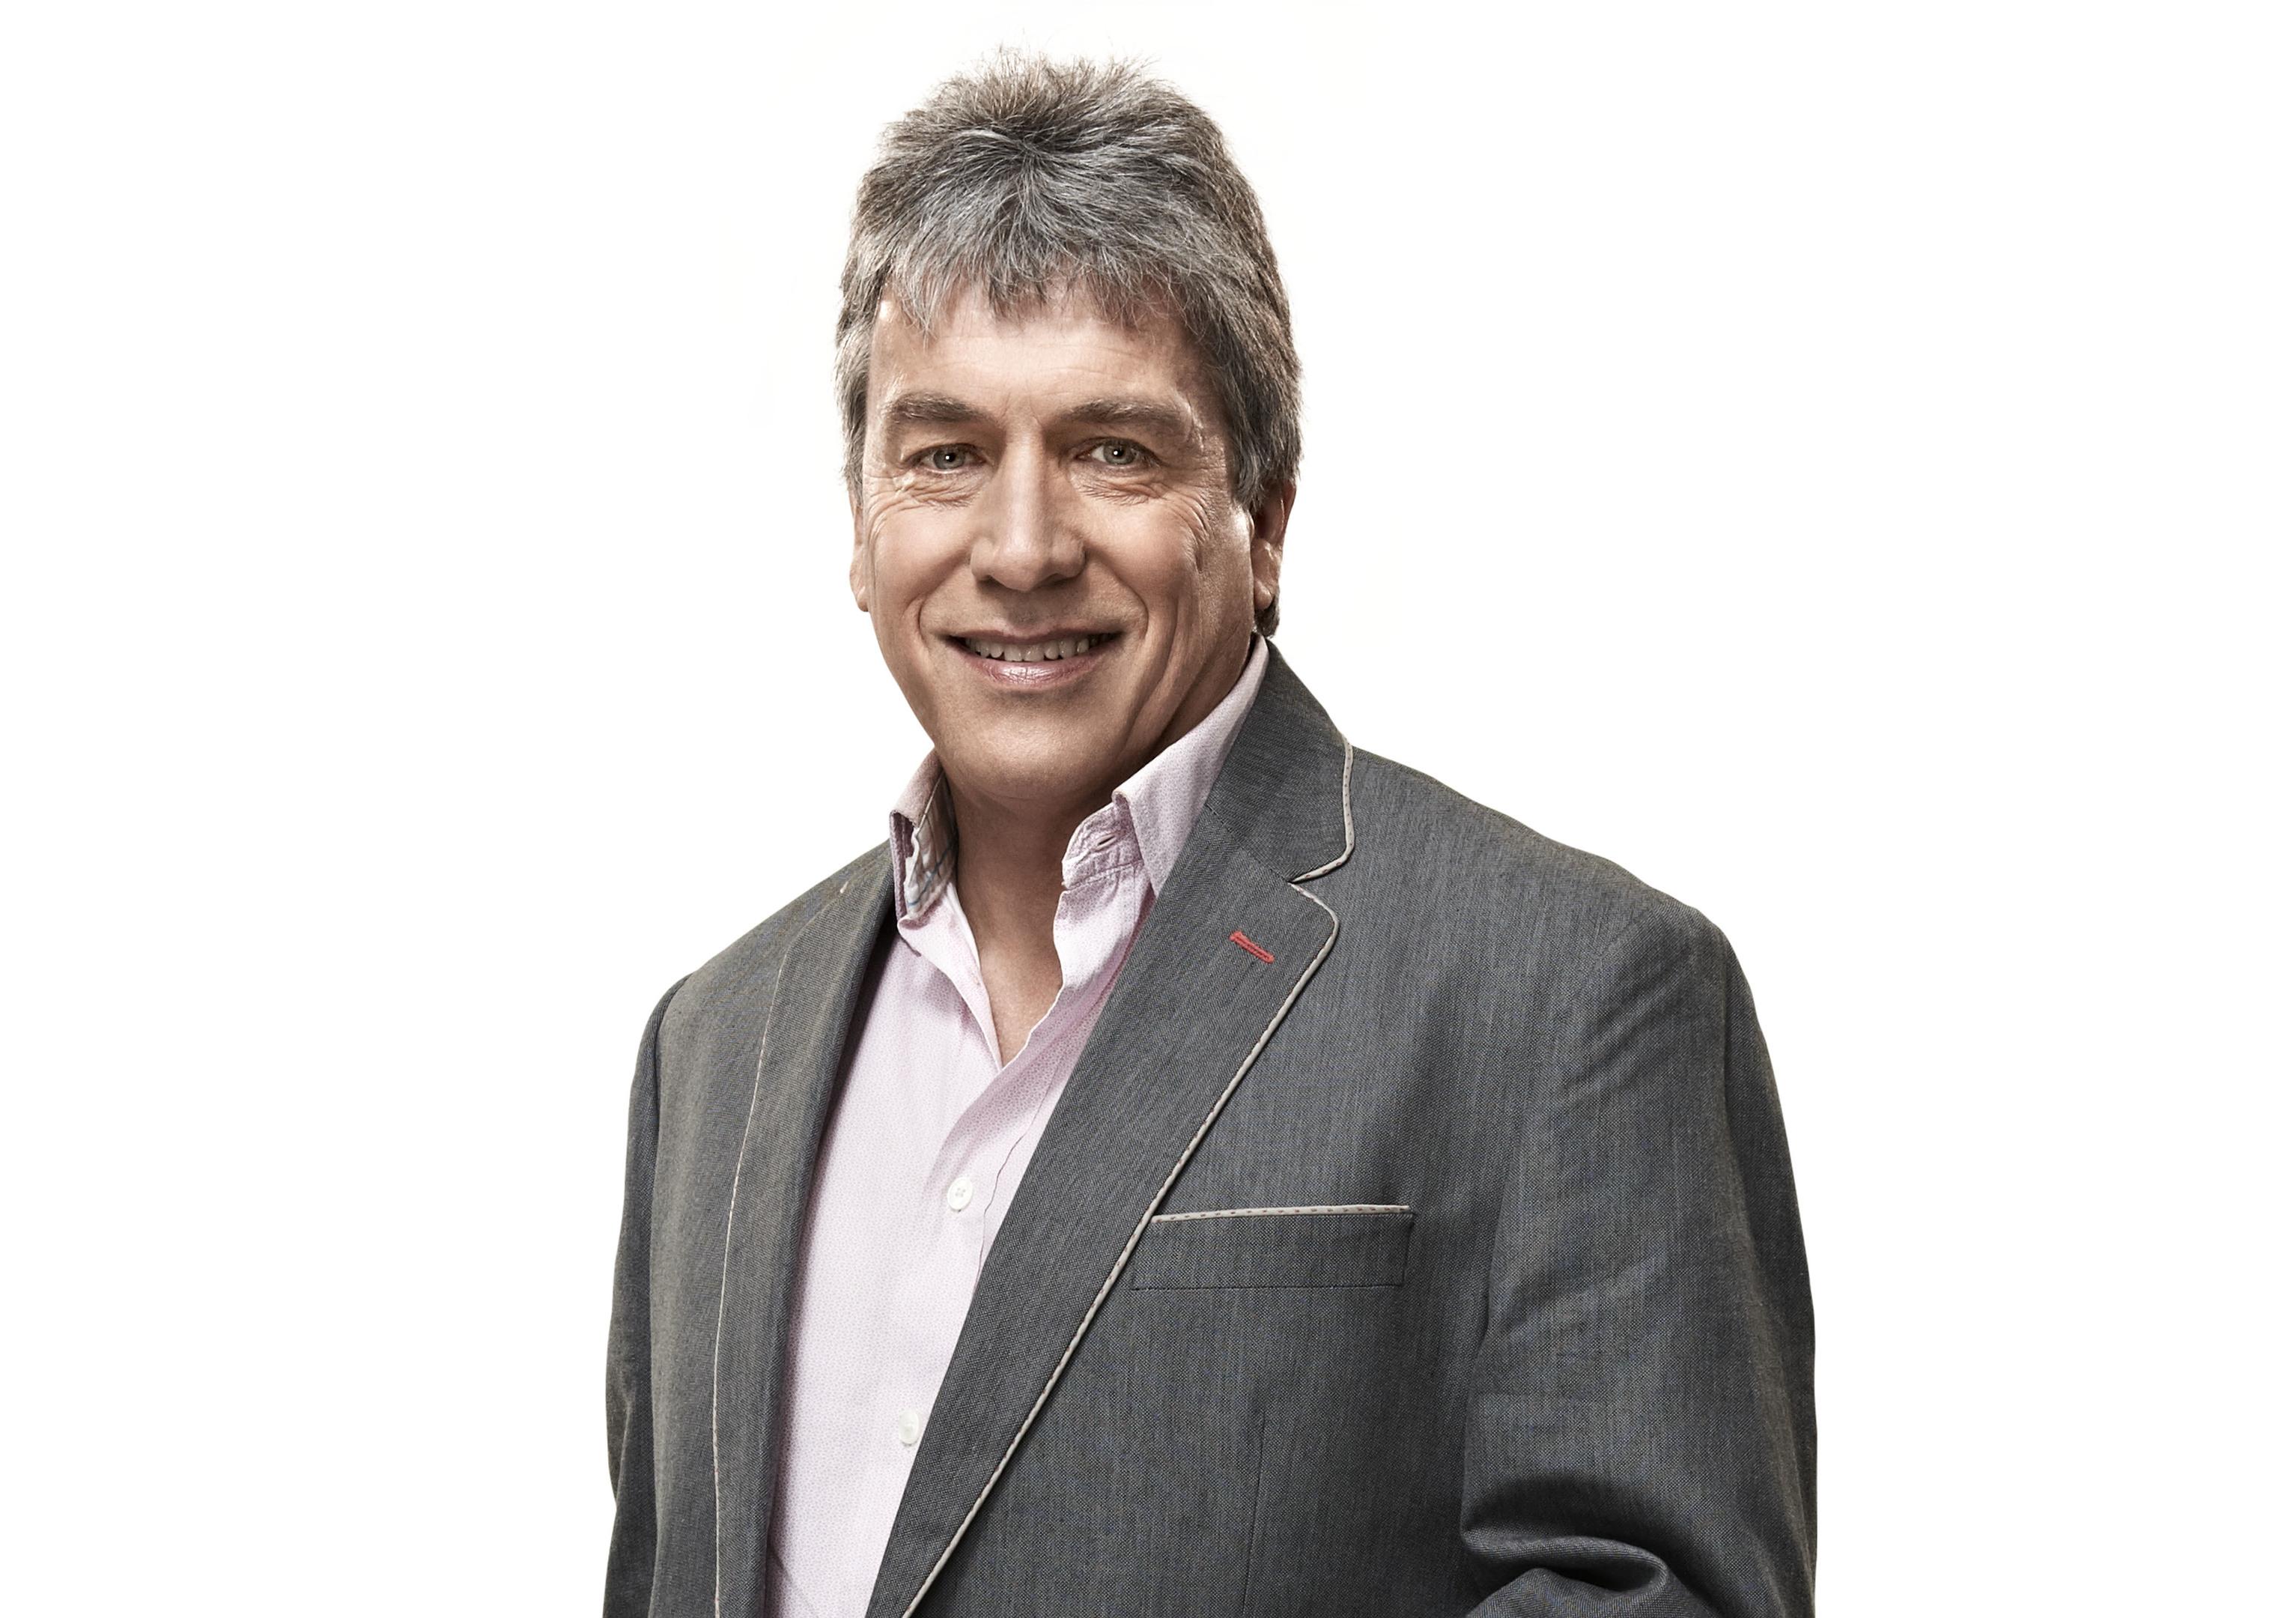 John Inverdale